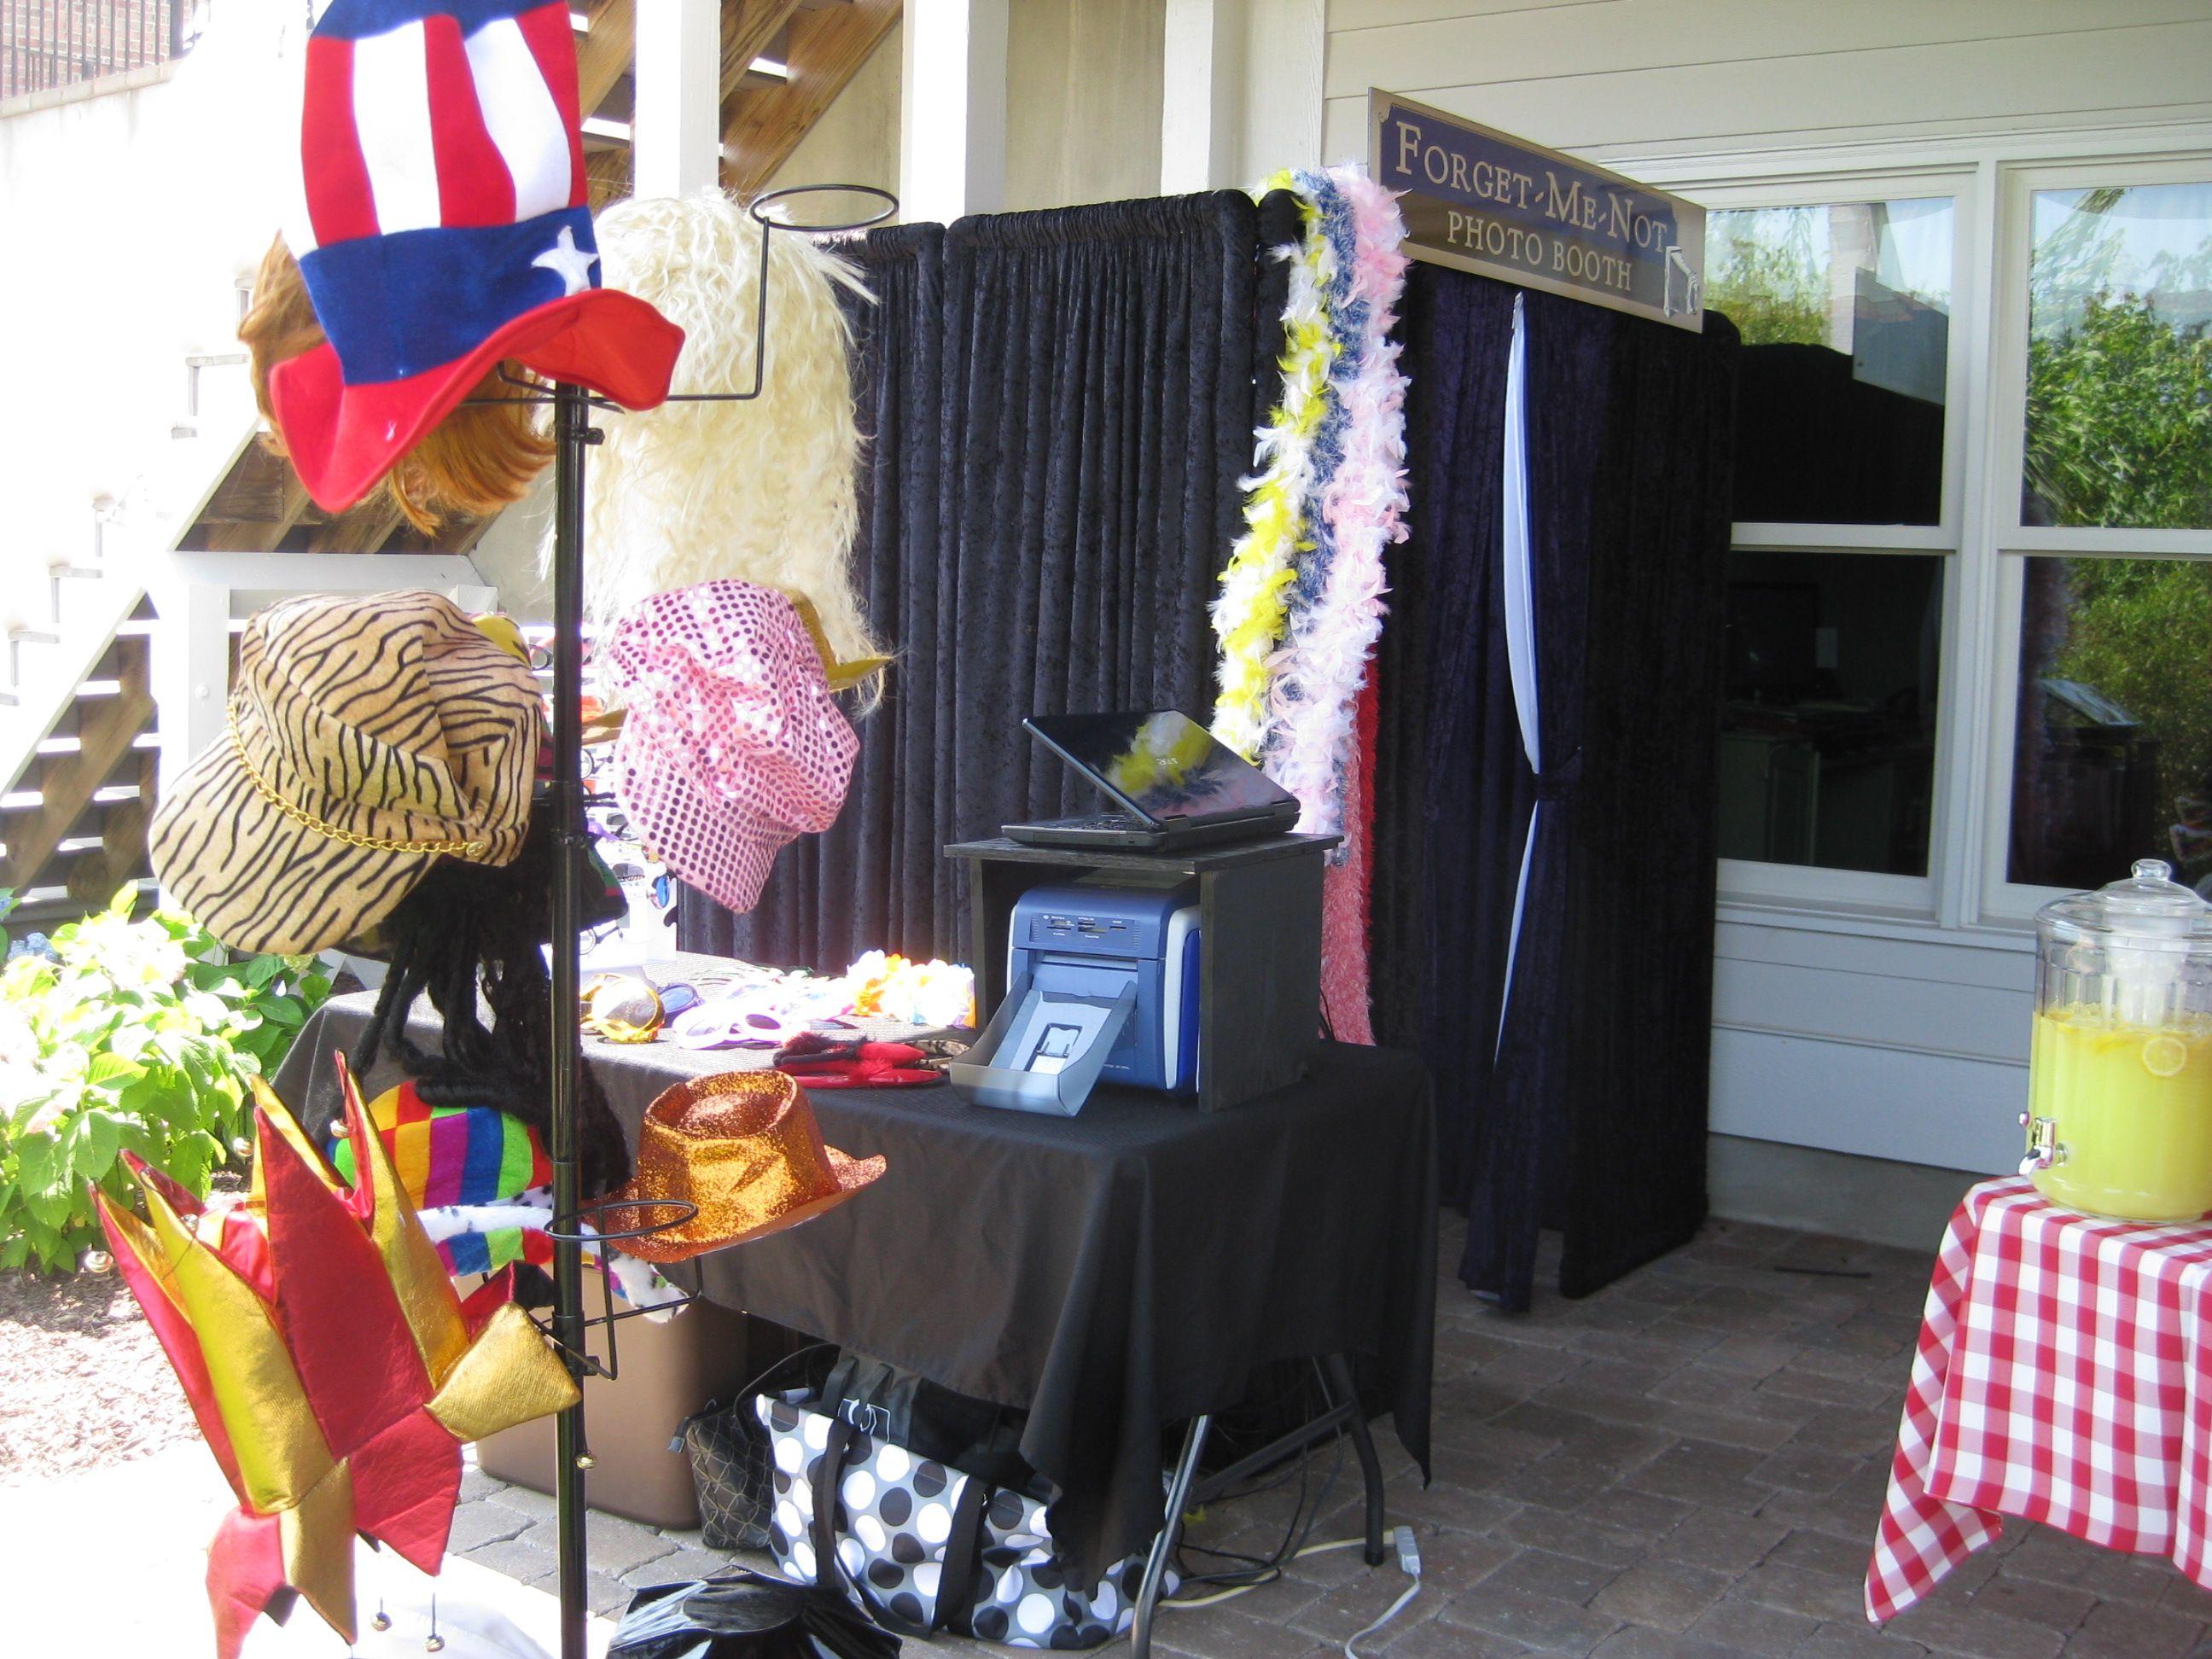 graduation photo booth backdrop - Google Search